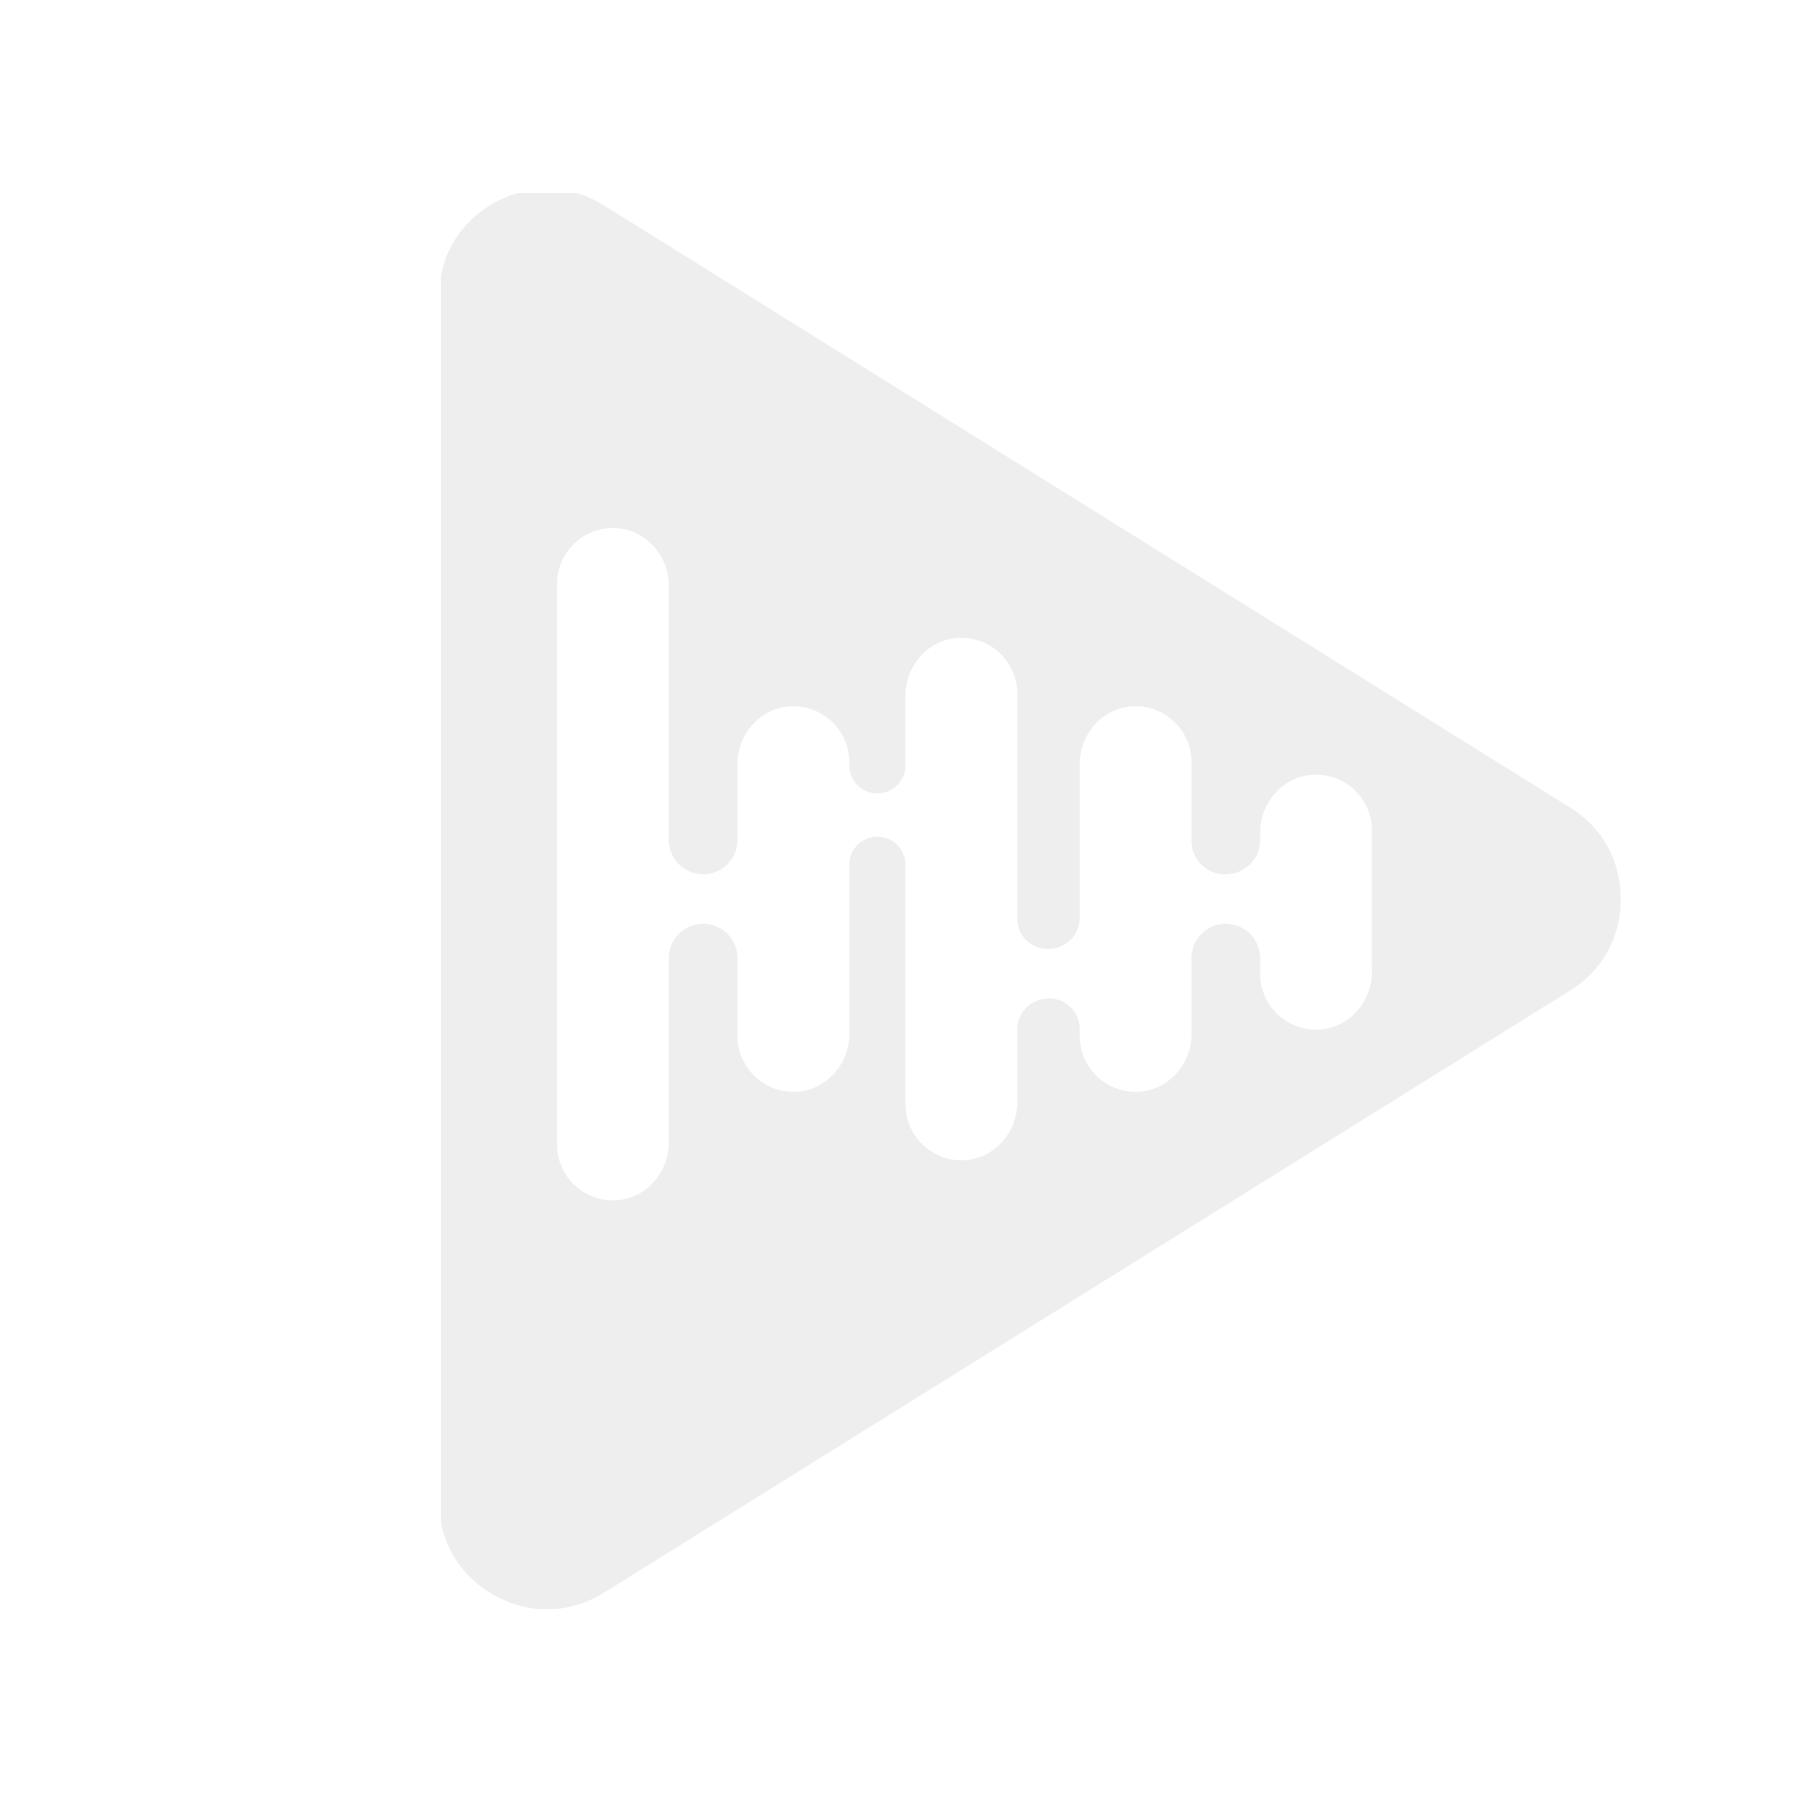 Speedsignal B-3474768